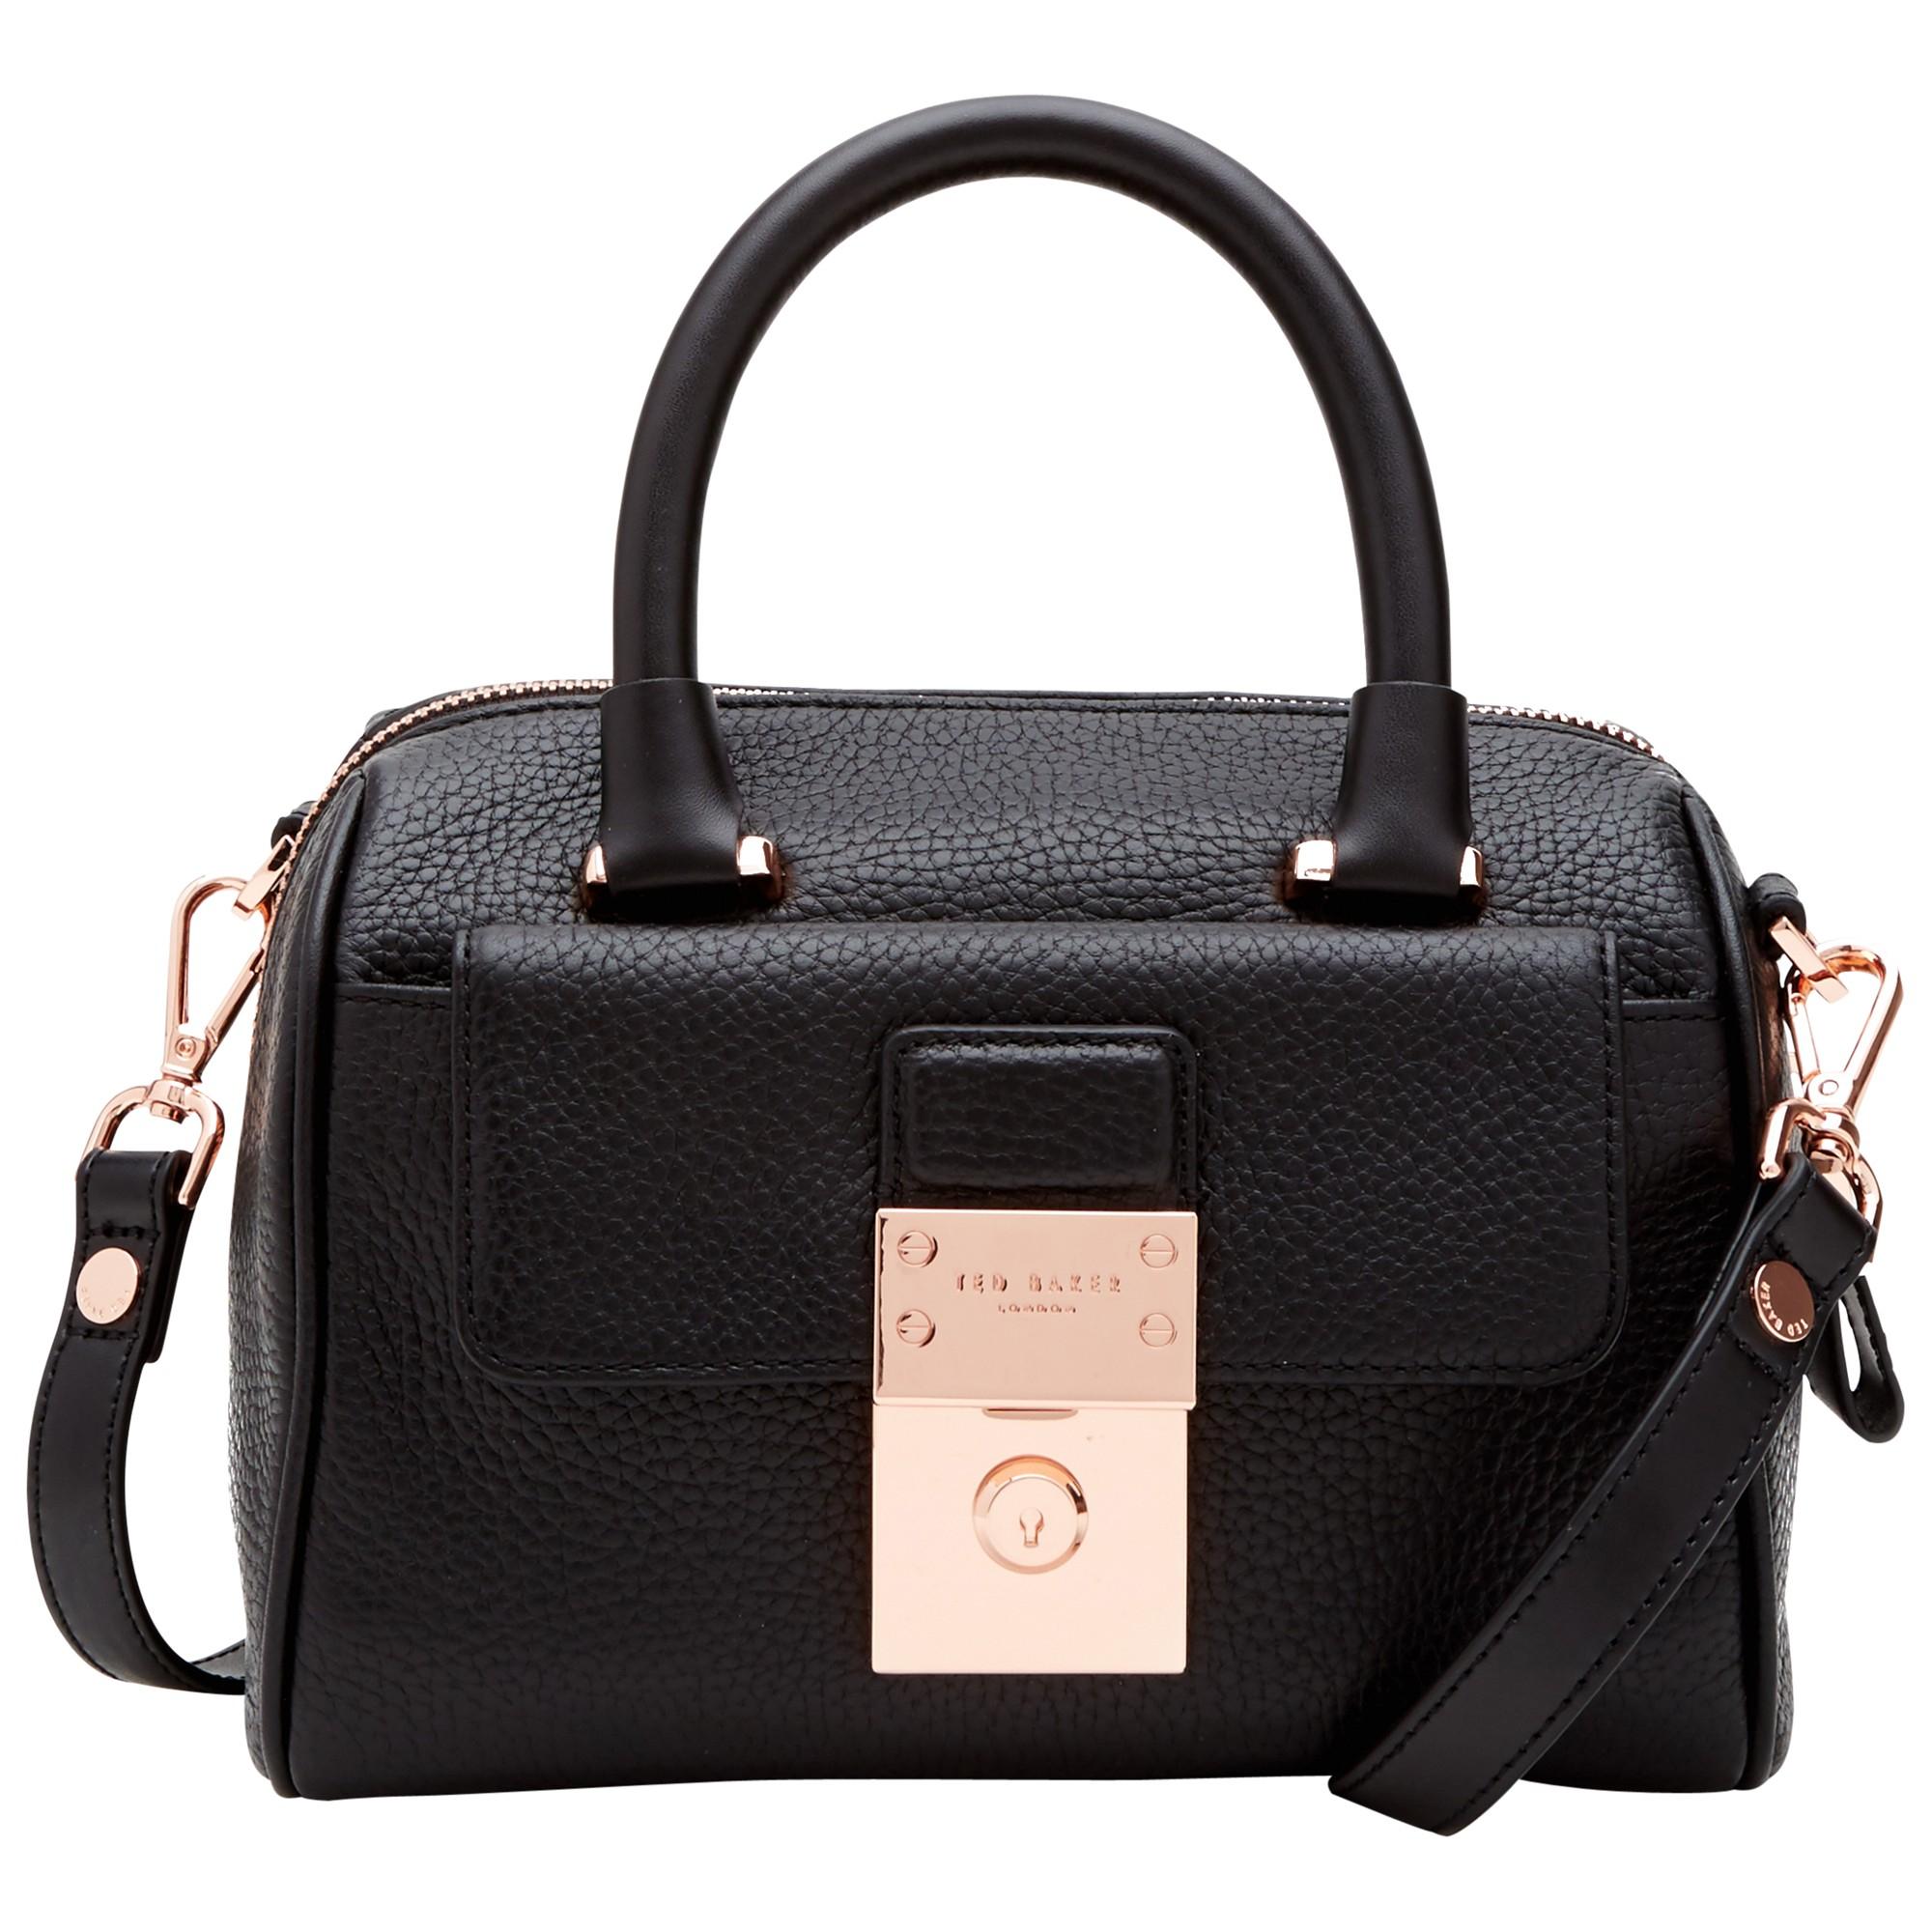 ted baker emilya leather mini duffle bag in black lyst. Black Bedroom Furniture Sets. Home Design Ideas